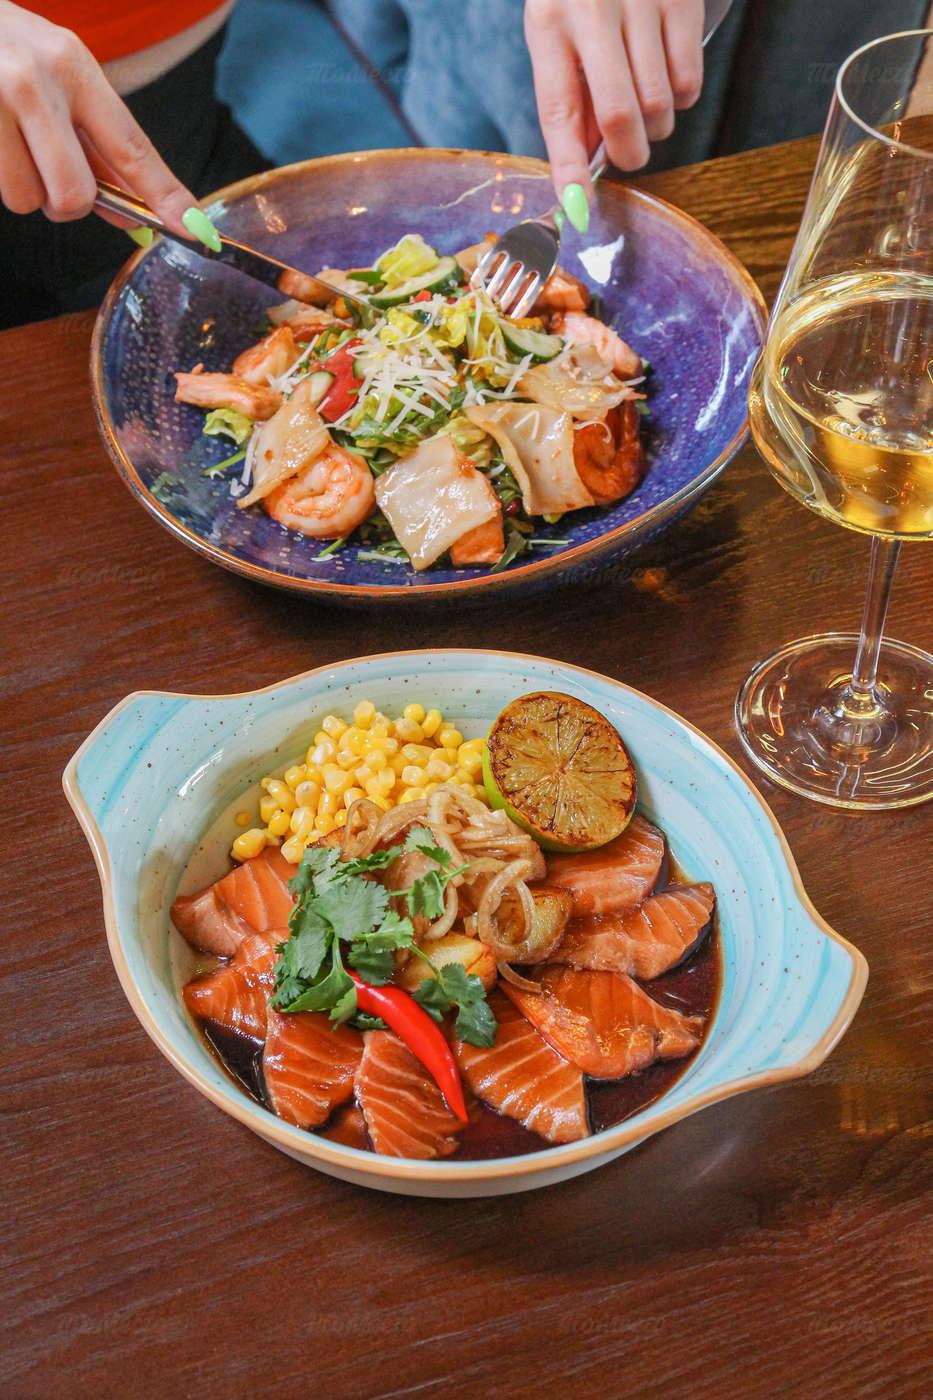 Меню ресторана Blossom на 7-ом км Пятницкого шоссе фото 26